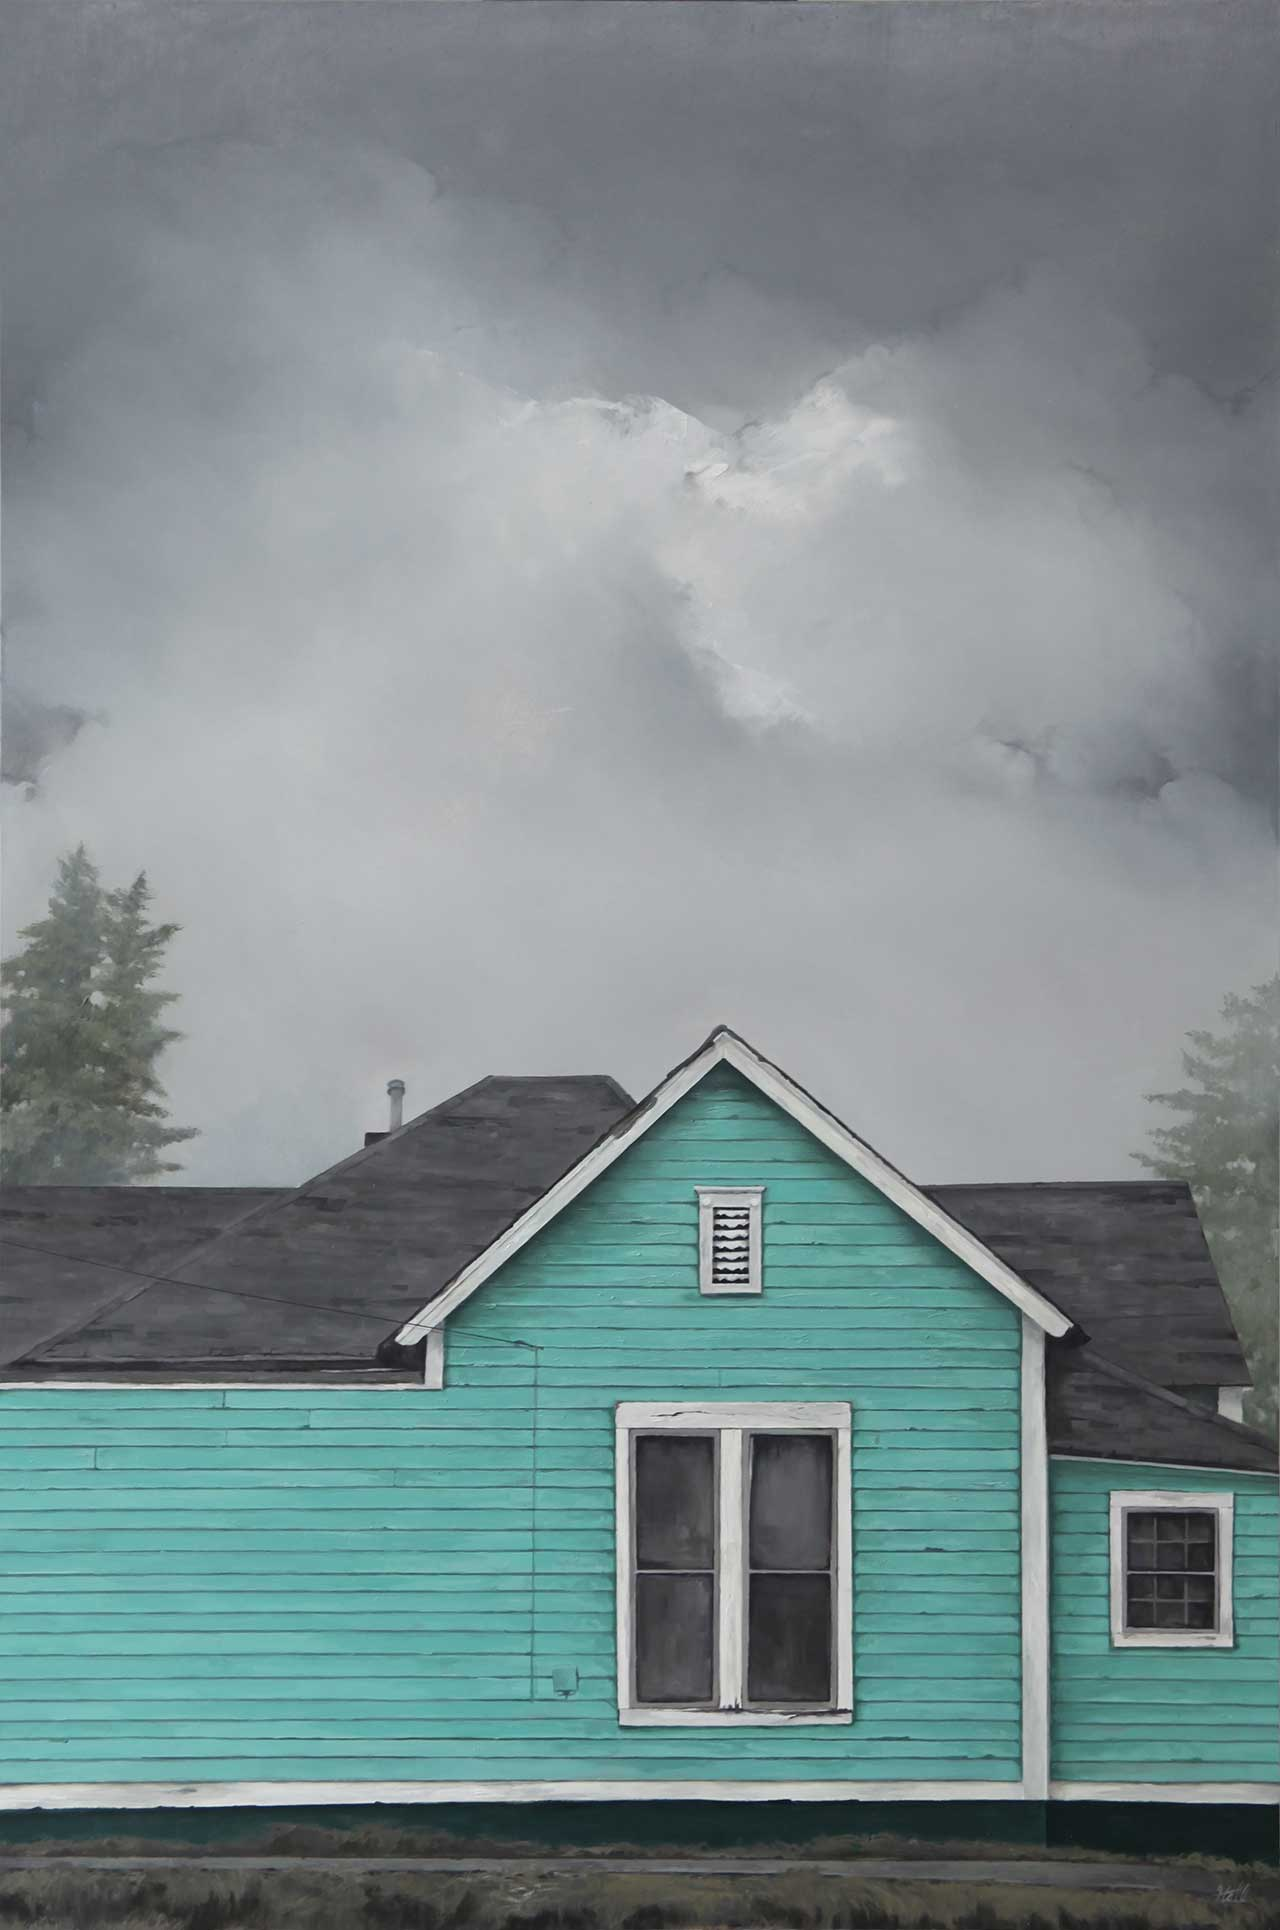 "Adam Hall,Blue Collar Dreams, 24"" x 36"", oil on panel. CourtesyRobert Lange Studios and the artist."